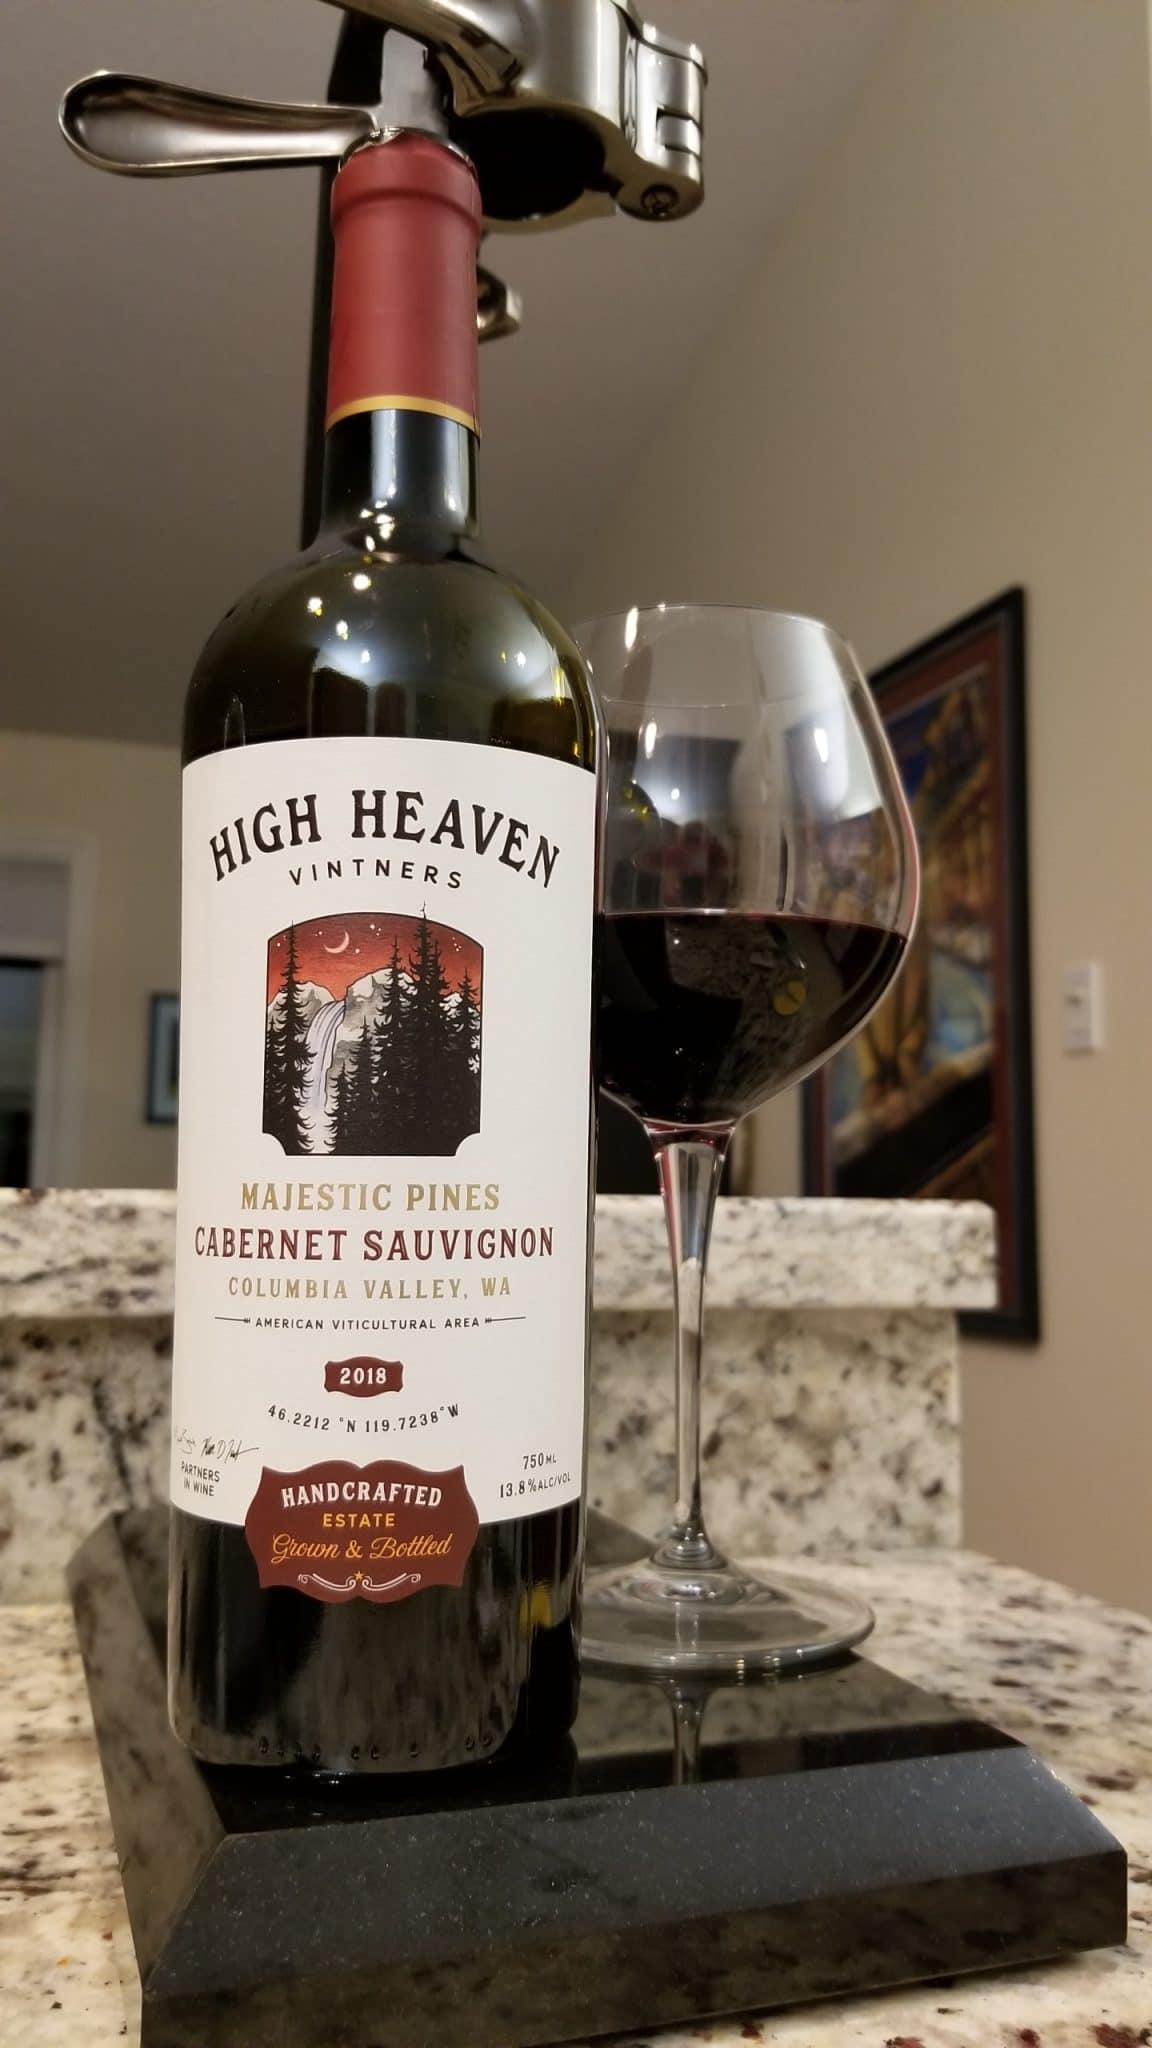 $19.95 - High Heaven Majestic Pines Cabernet Sauvignon 2018